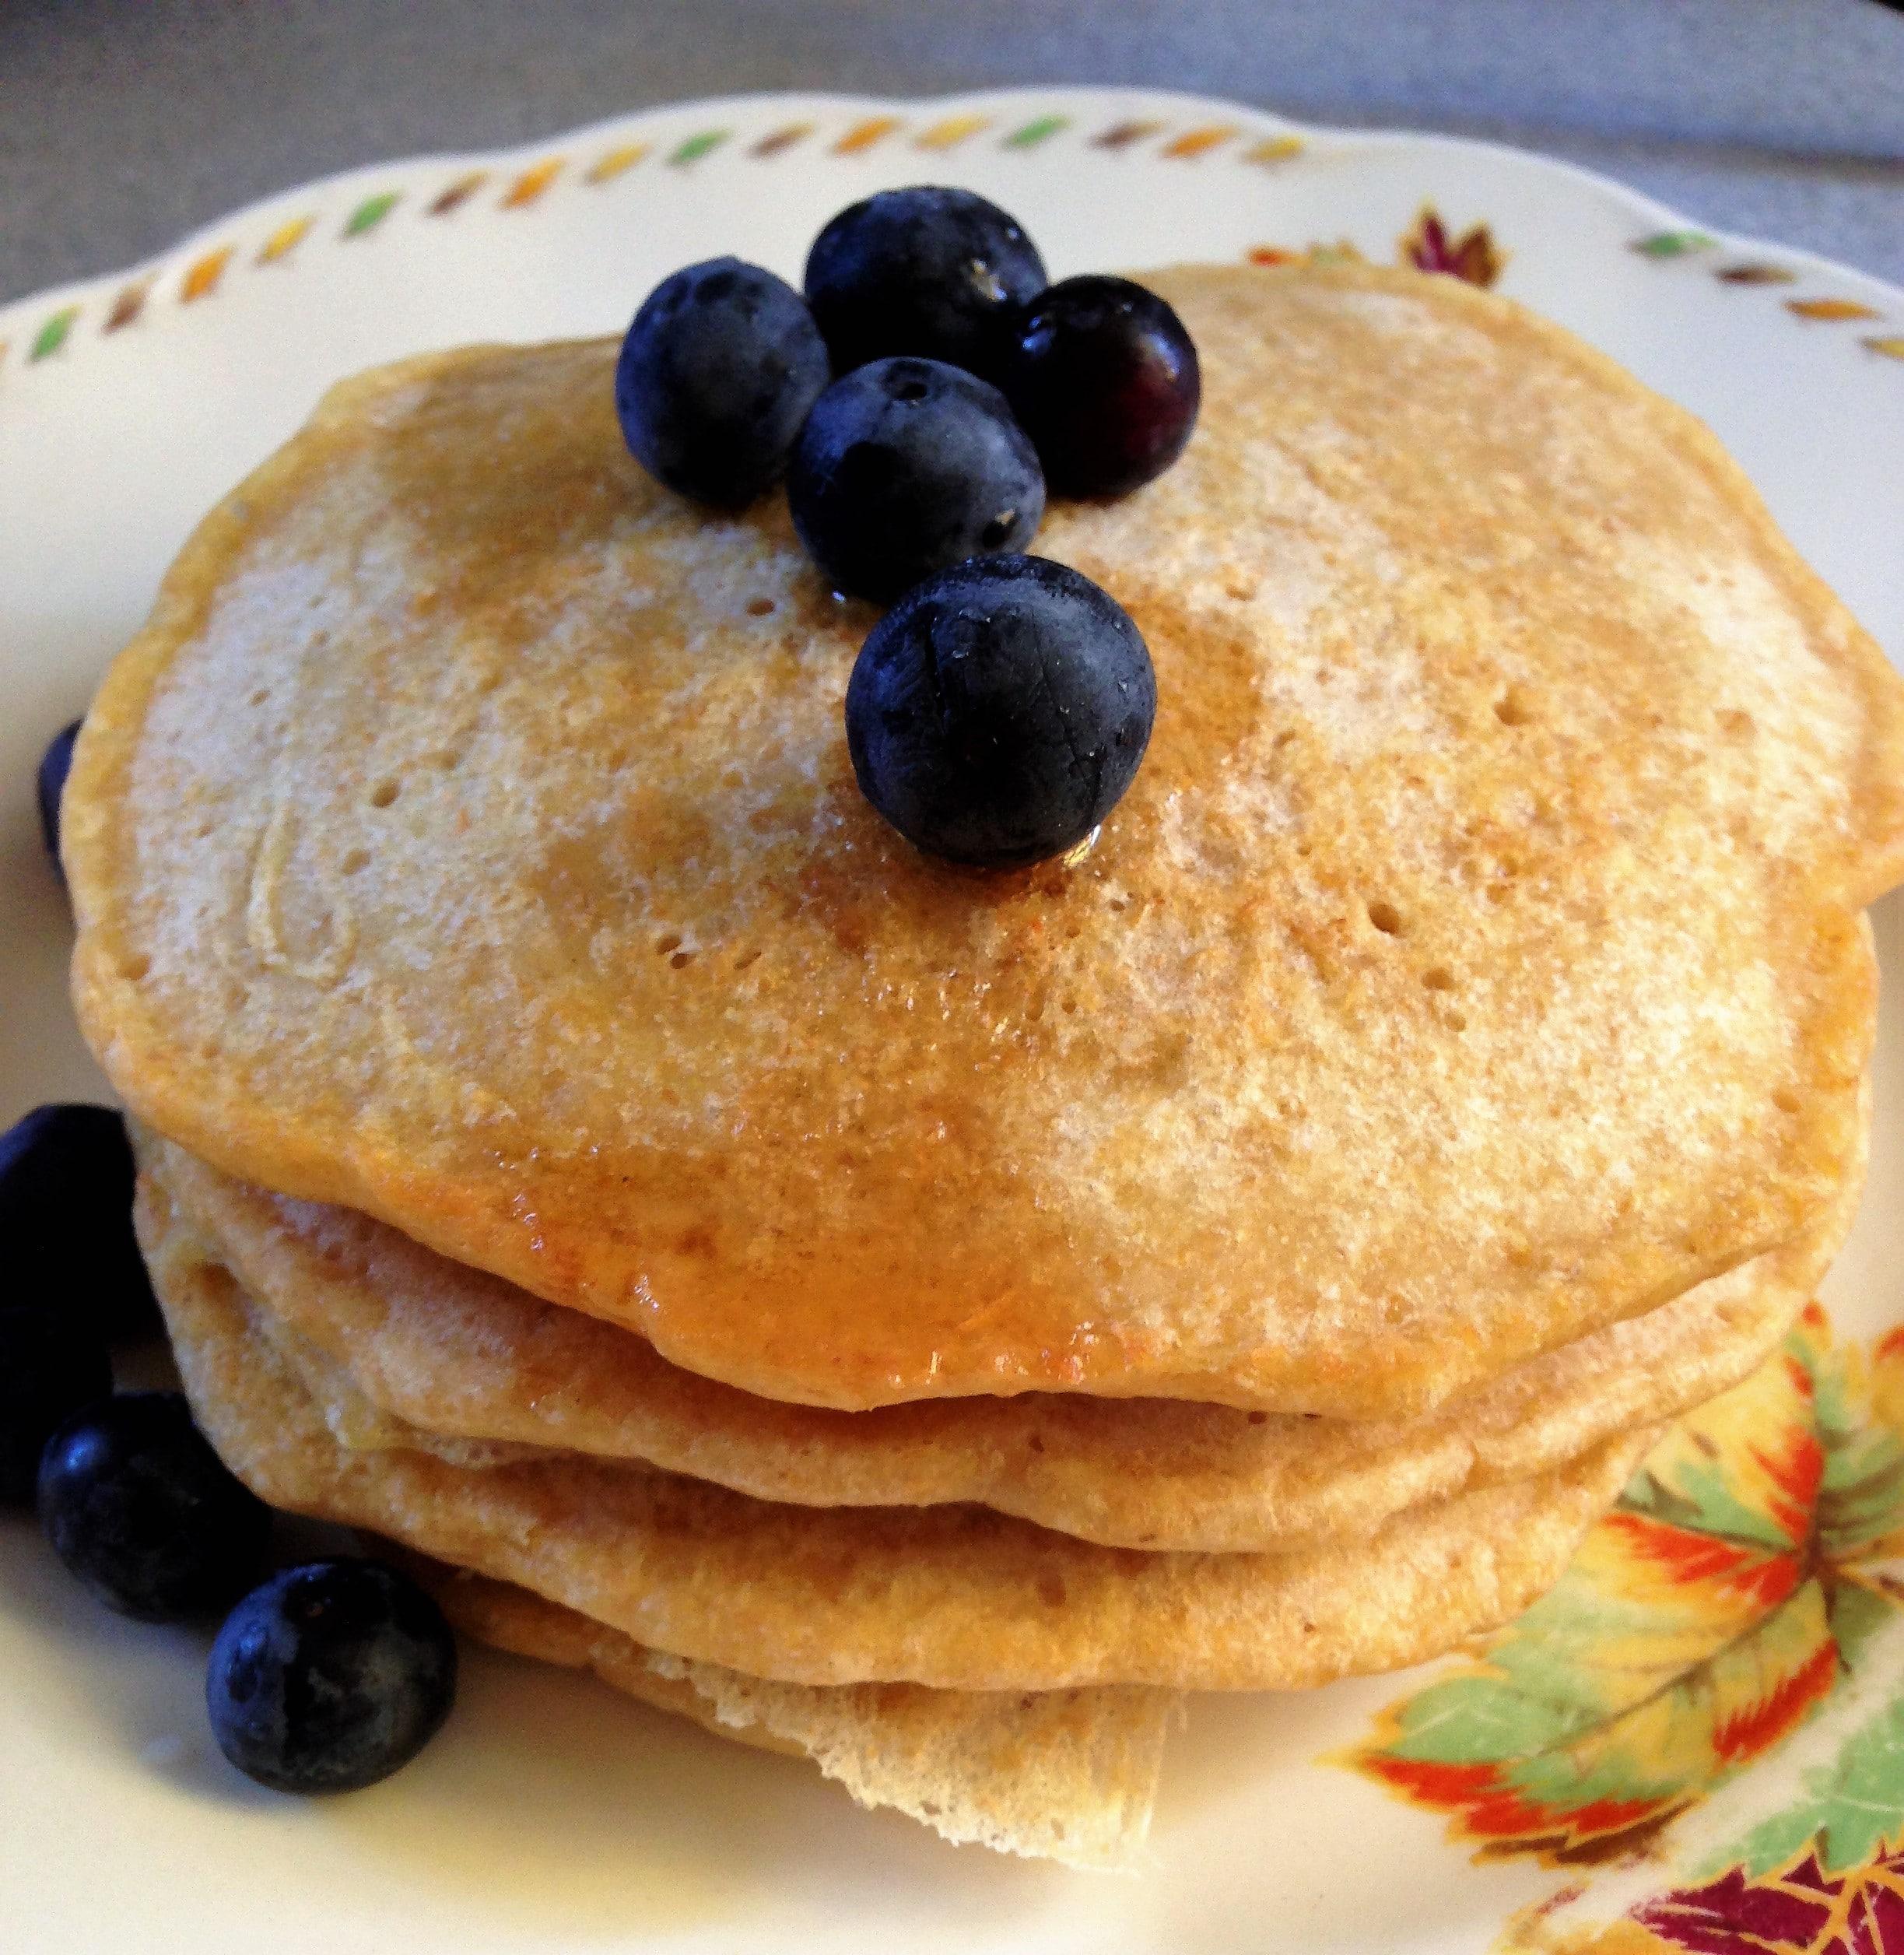 Dairy free pancakes 4 ways infinity foods to make the pancakes ccuart Gallery